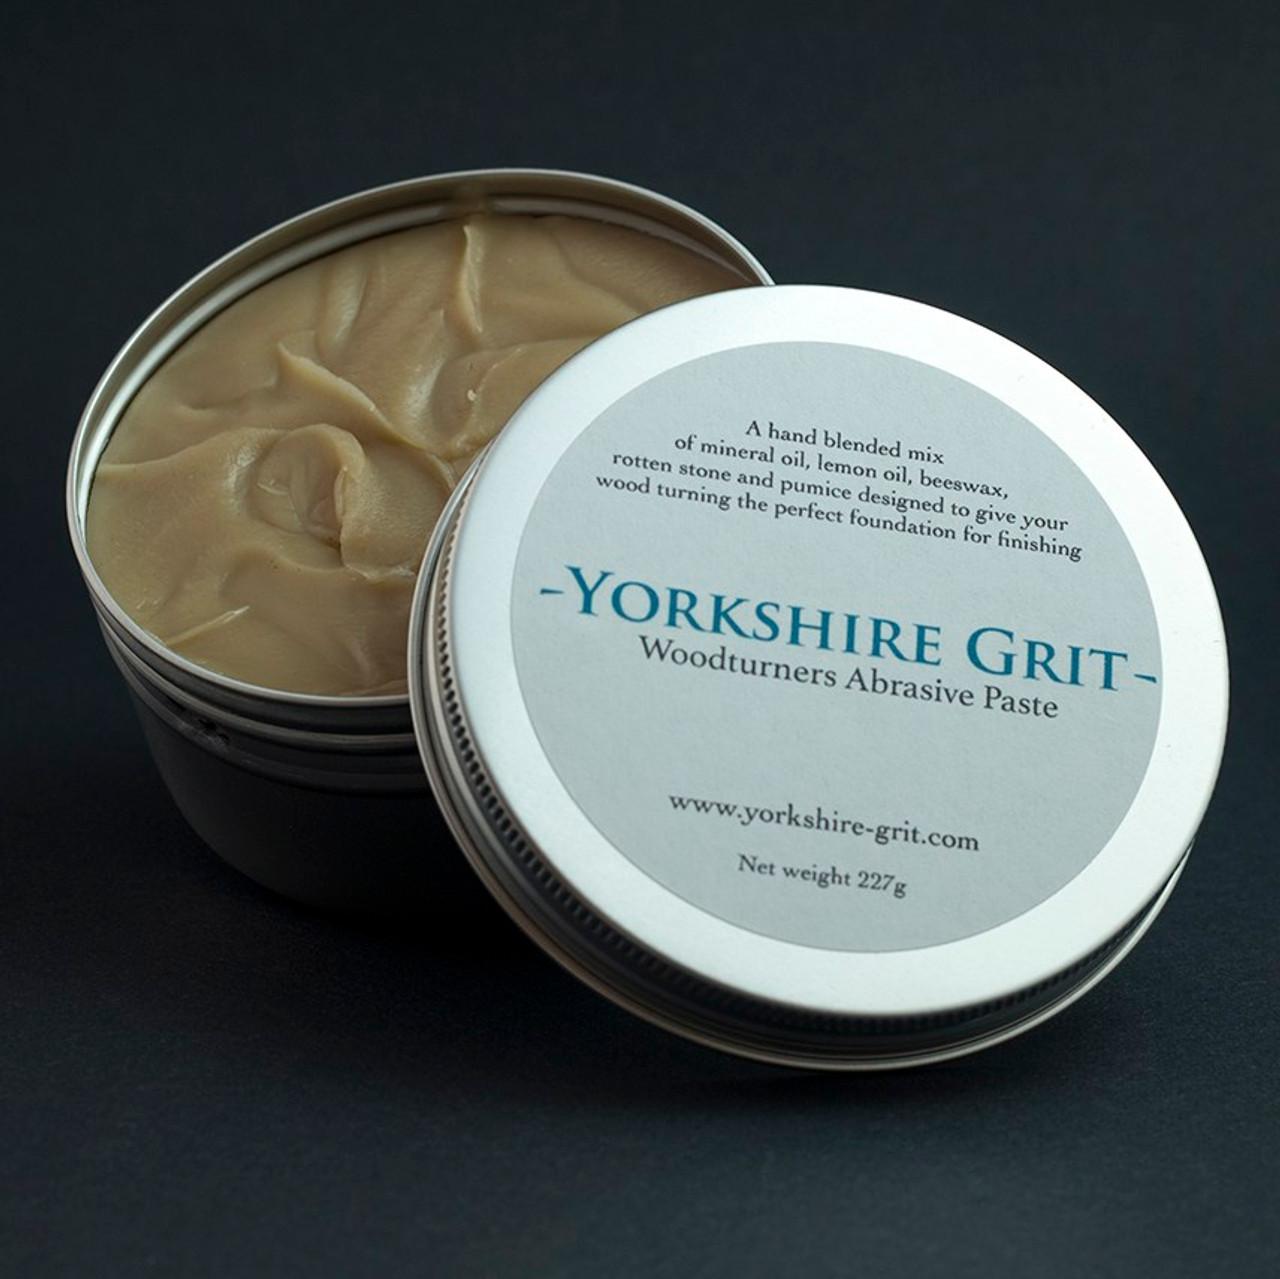 Yorkshire Grit Abrasive Paste - 227g